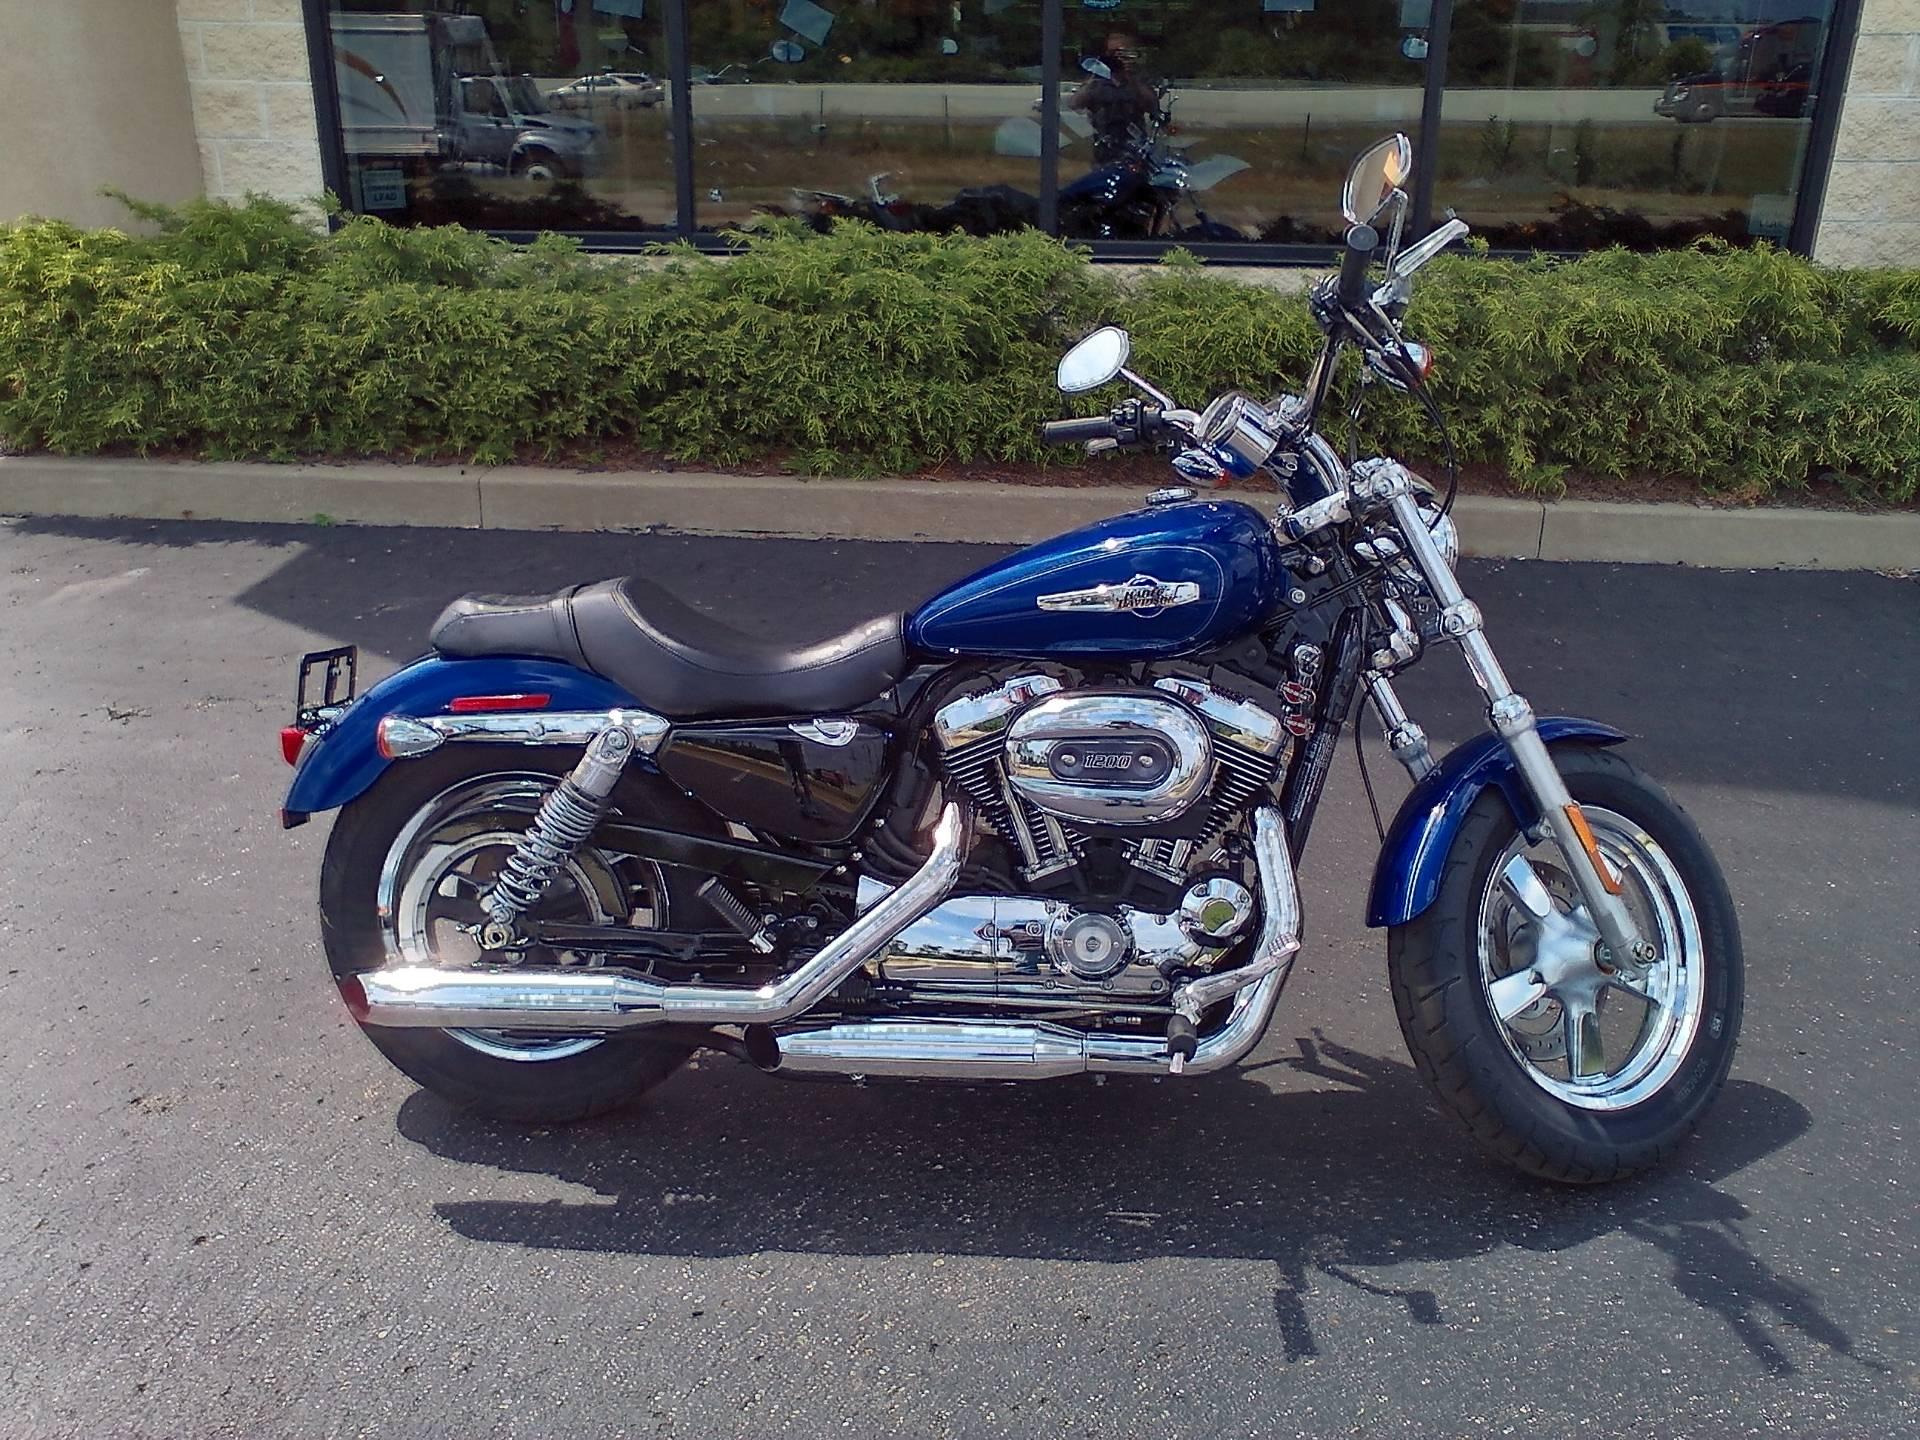 Used 2016 Harley-Davidson 1200 Custom | Motorcycles in North